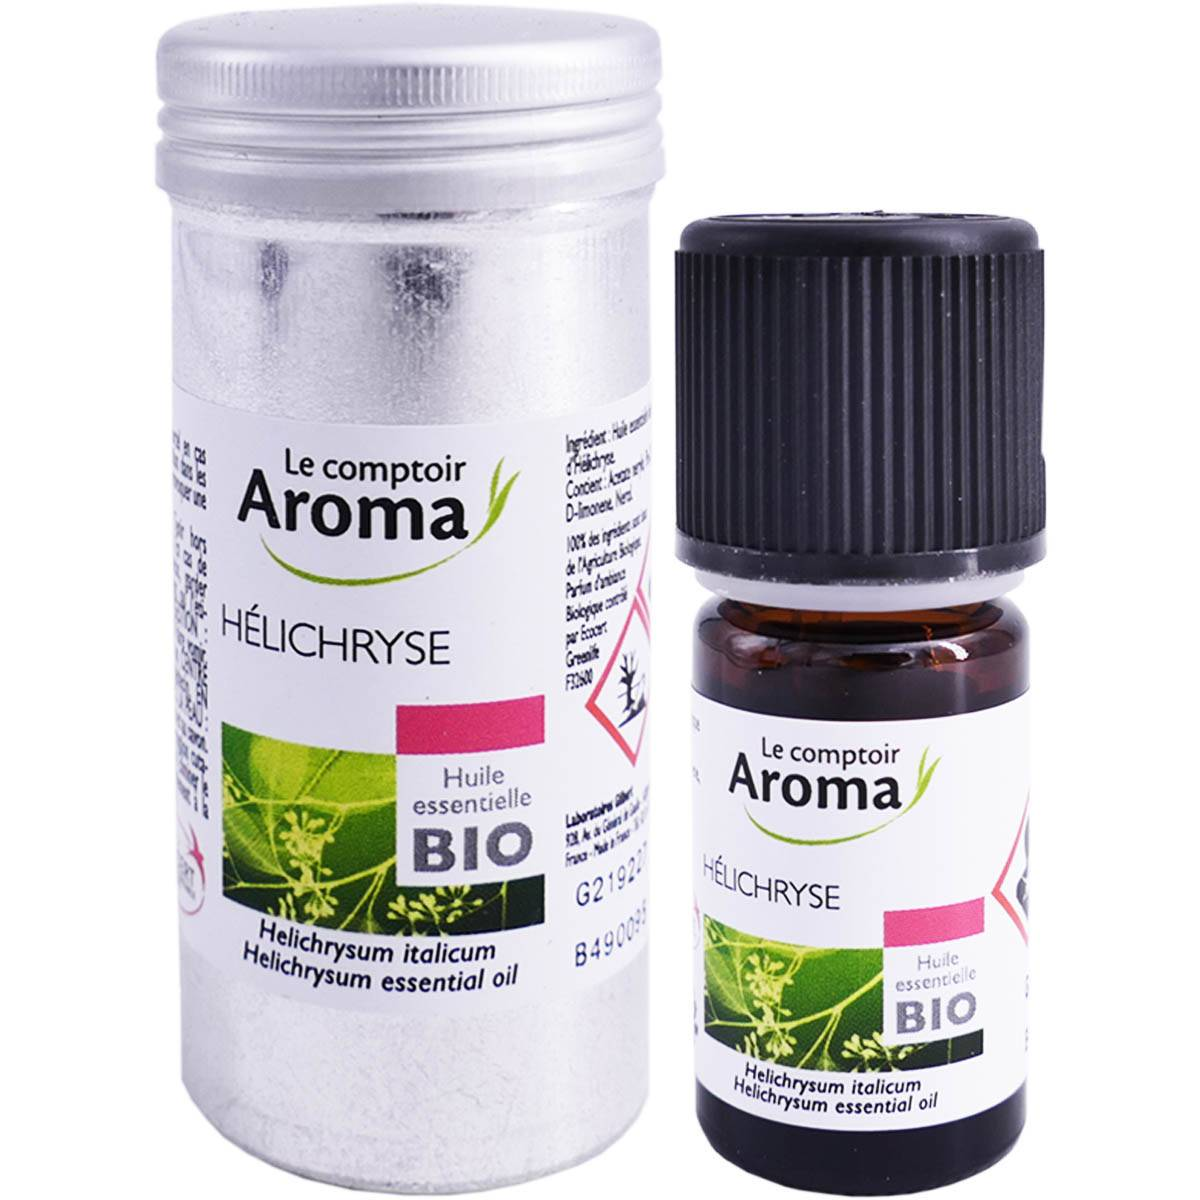 Le comptoir aroma huile essentielle helichryse bio 5ml